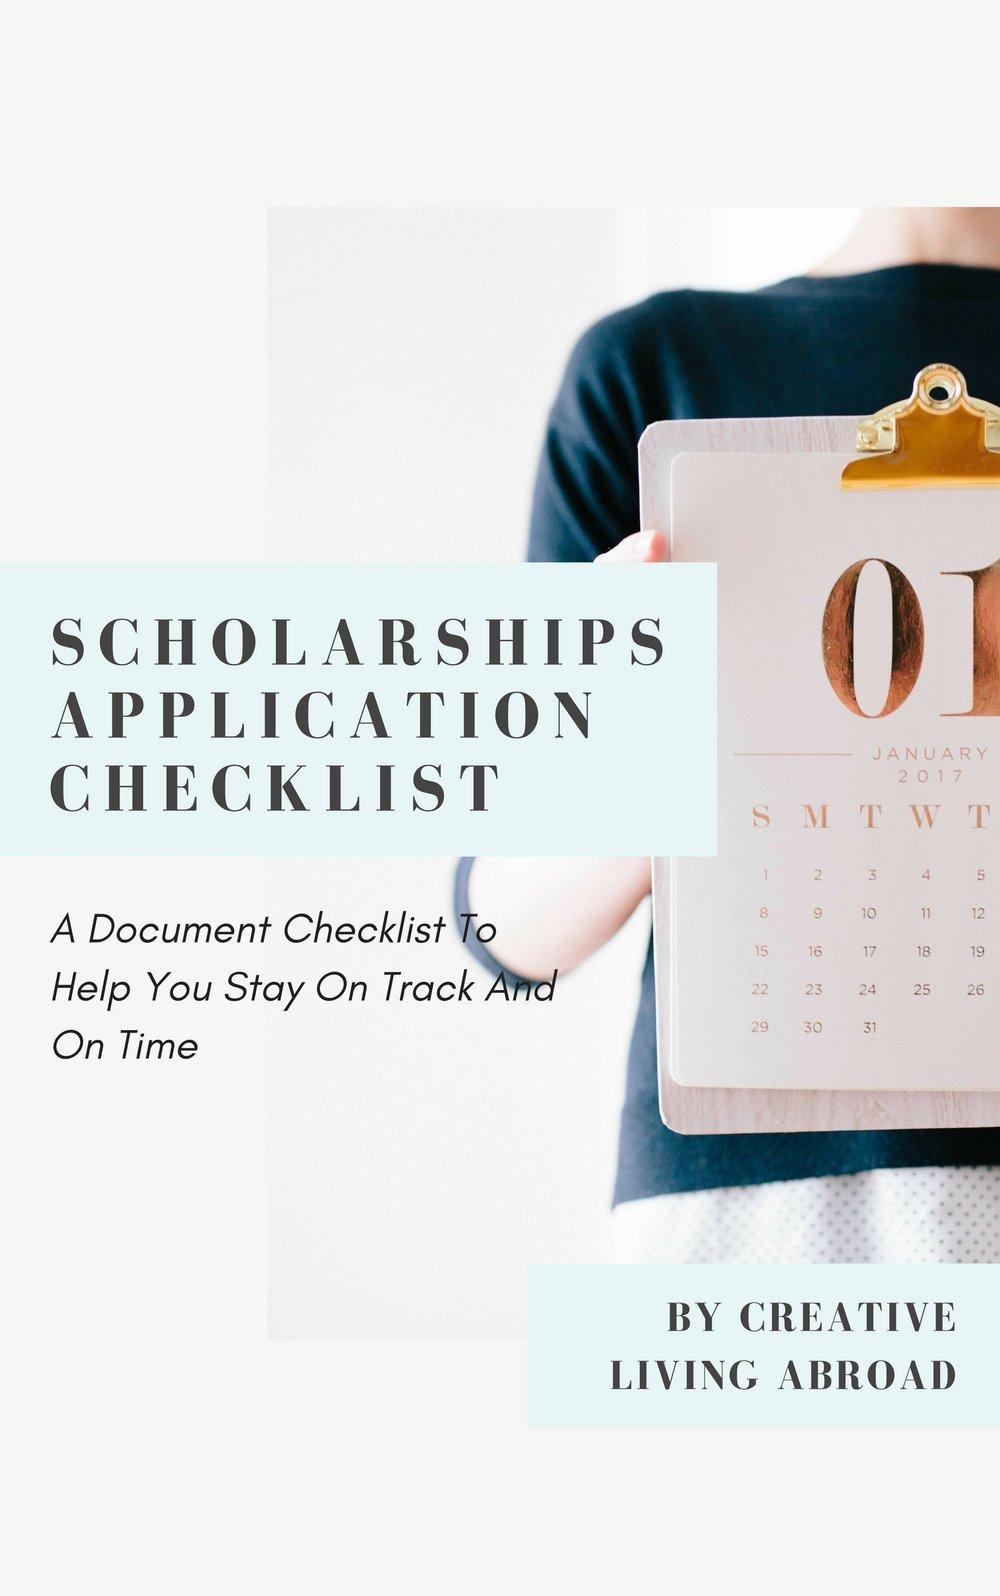 scholarships application checklist printable